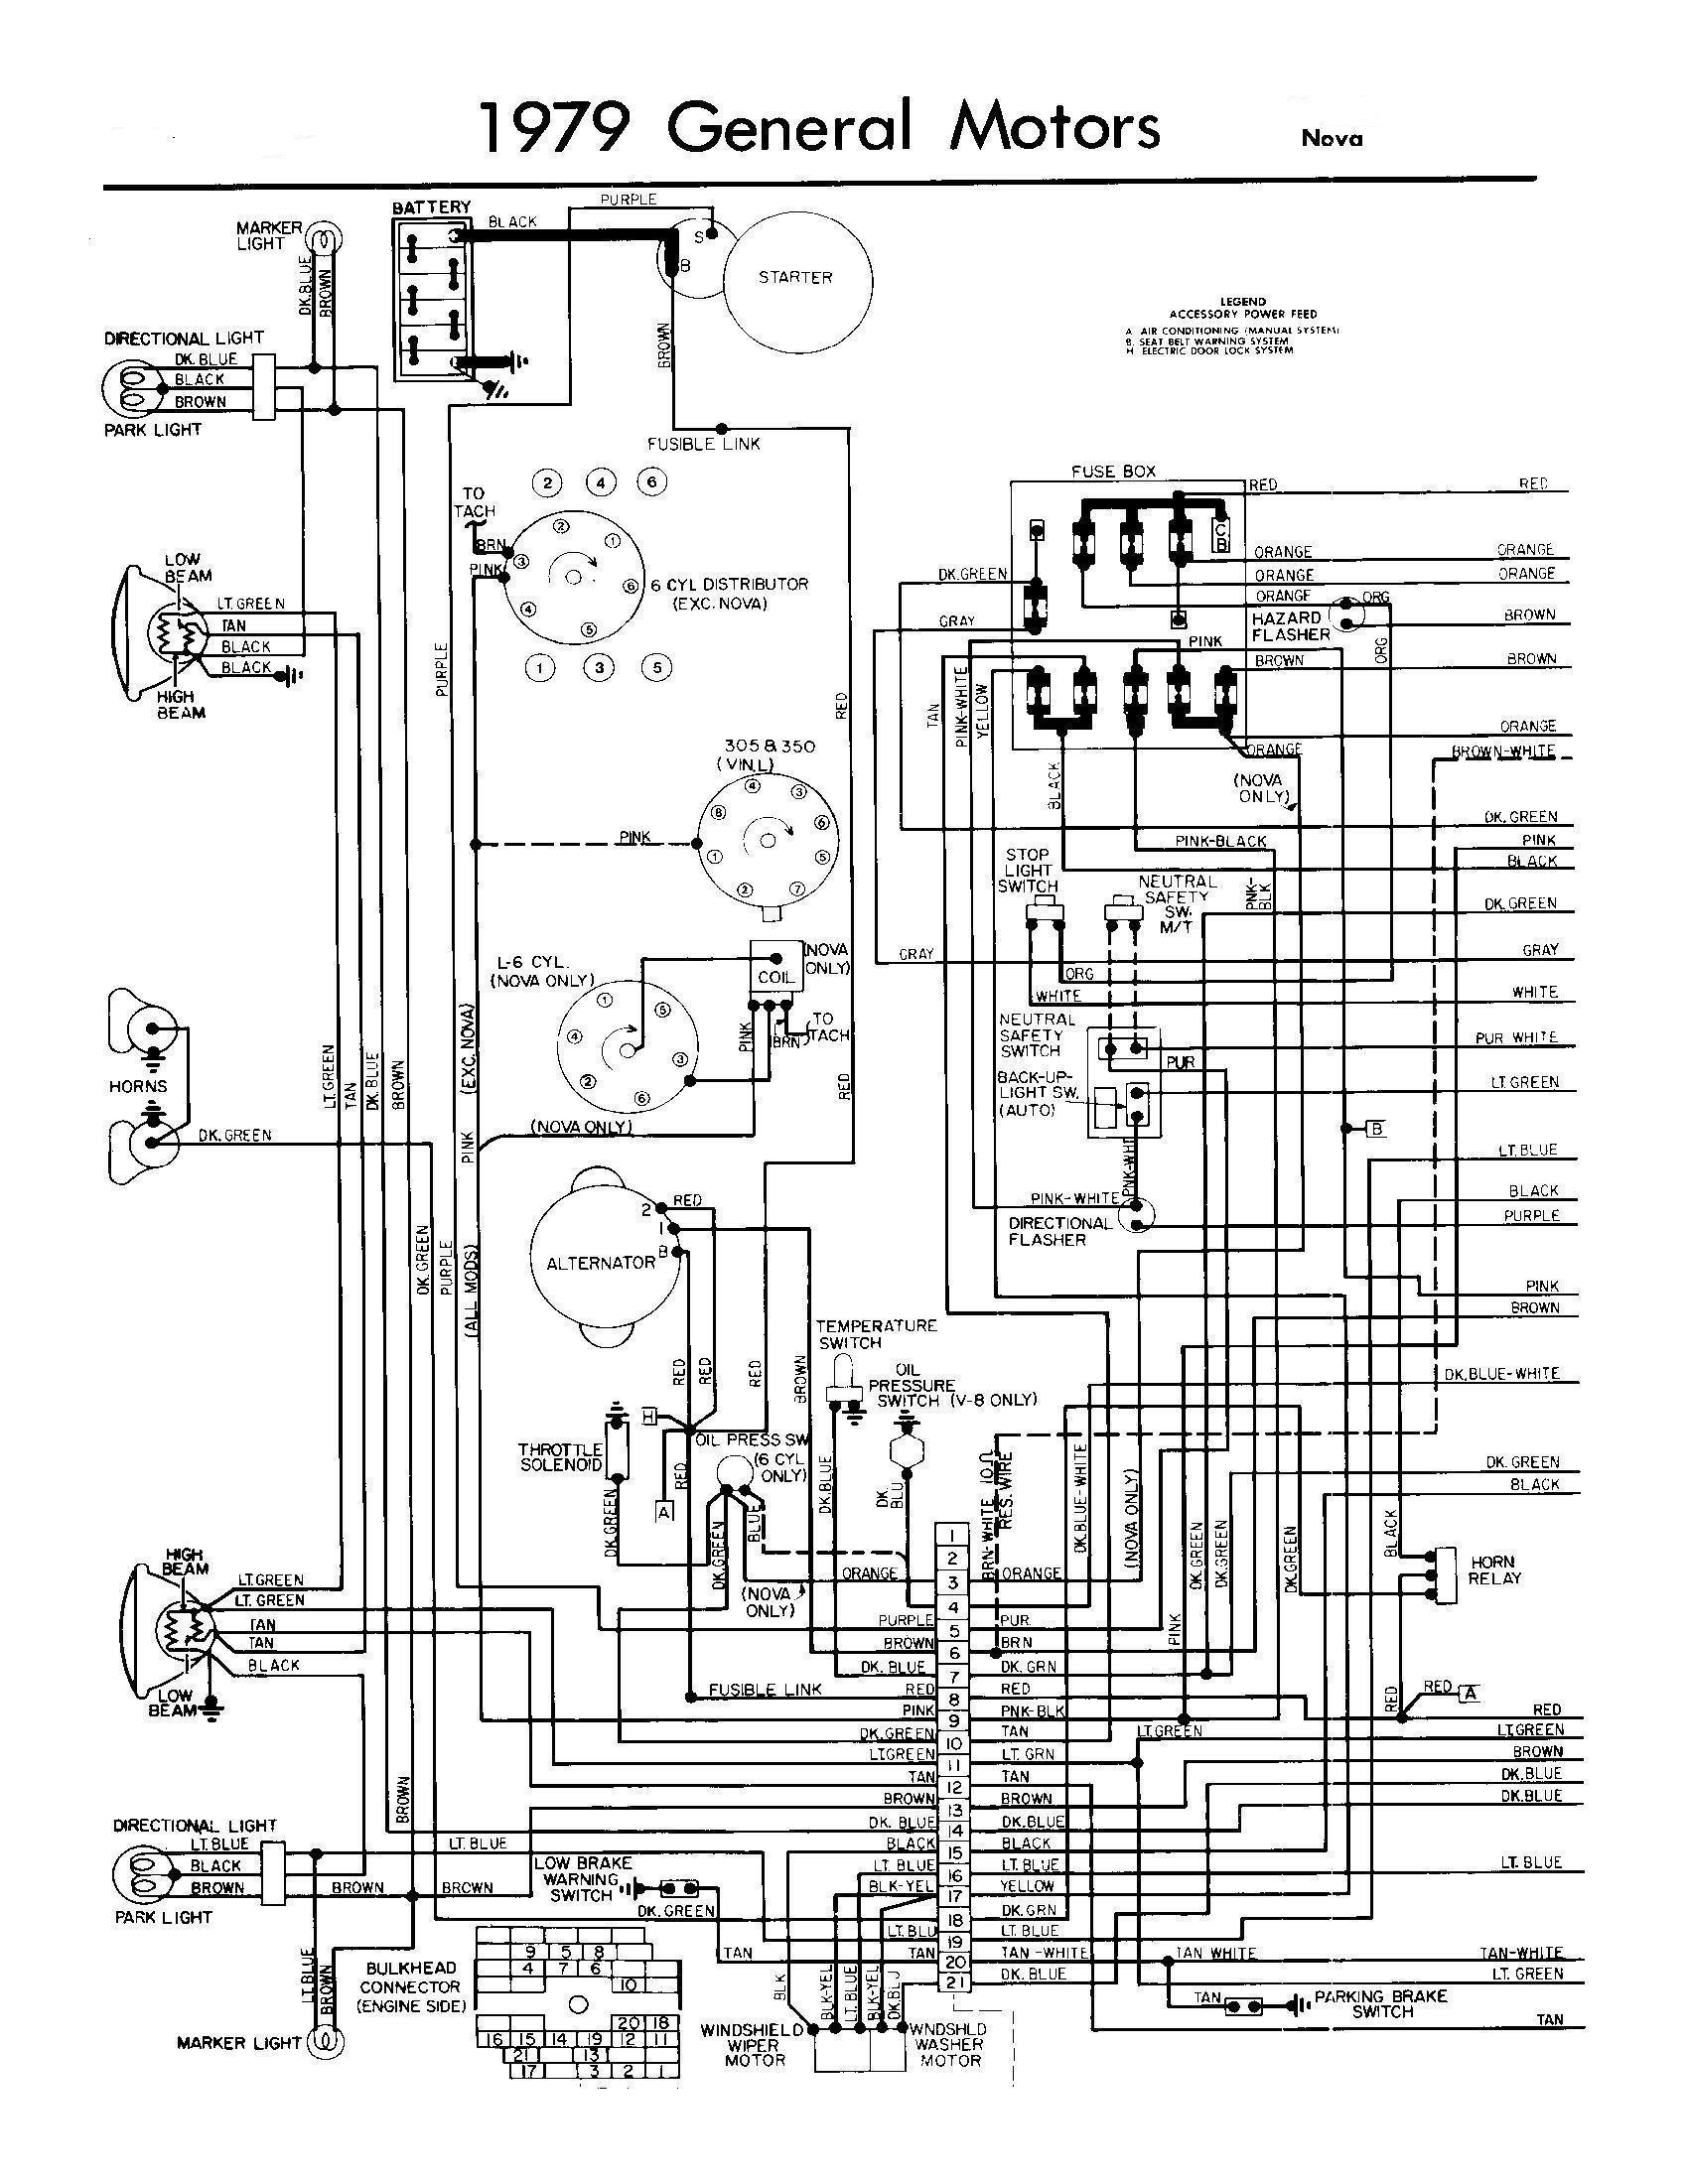 Motorola Alternator Wiring Diagram John Deere Fresh Vw Golf Mk1 Alternator Wiring Diagram Wire Center •